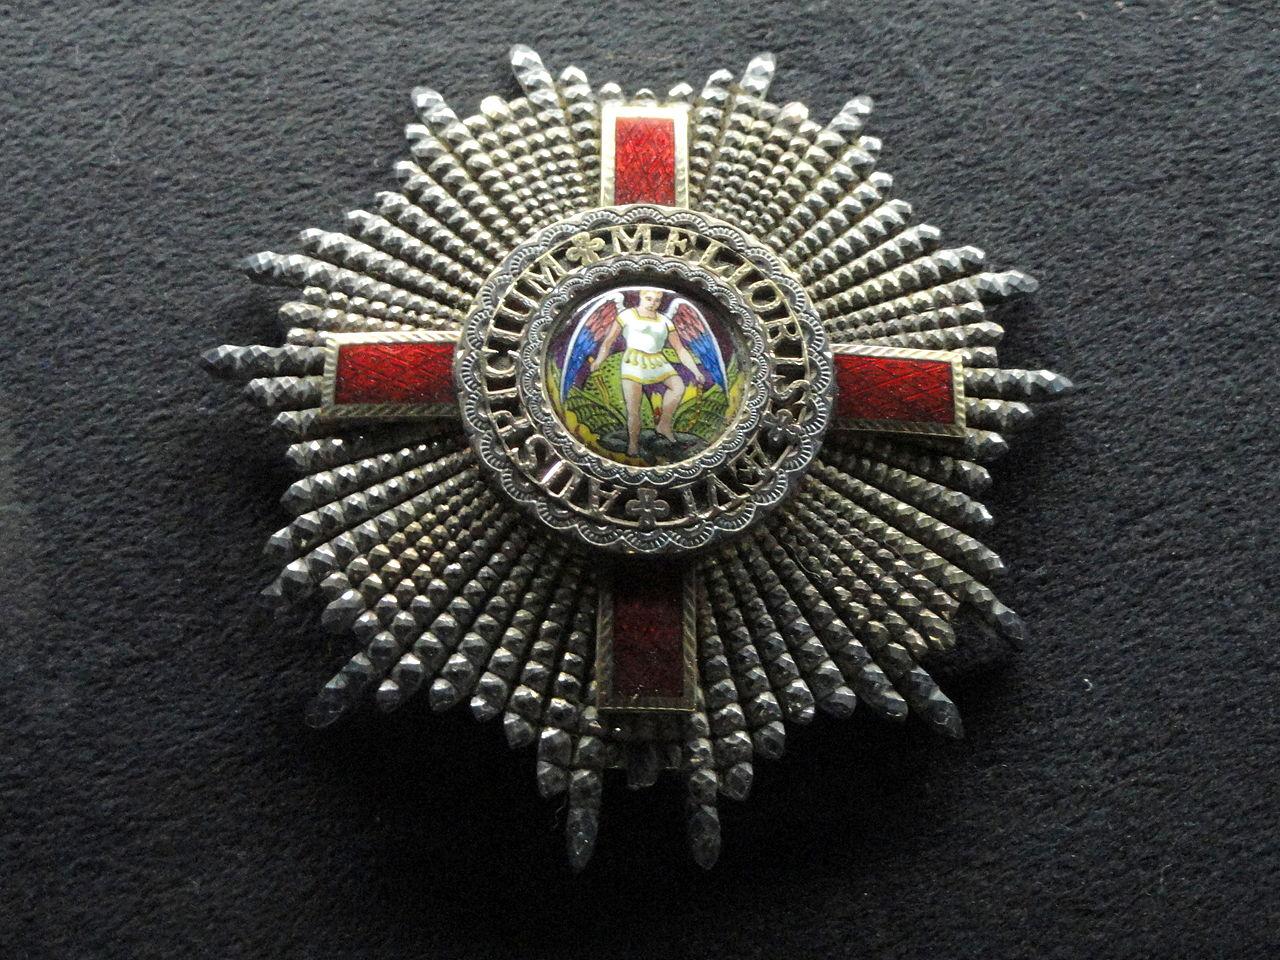 Grand Cross of the Order of St Michael and St George (Great Britain) - Memorial JK - Brasilia - DSC00425.JPG